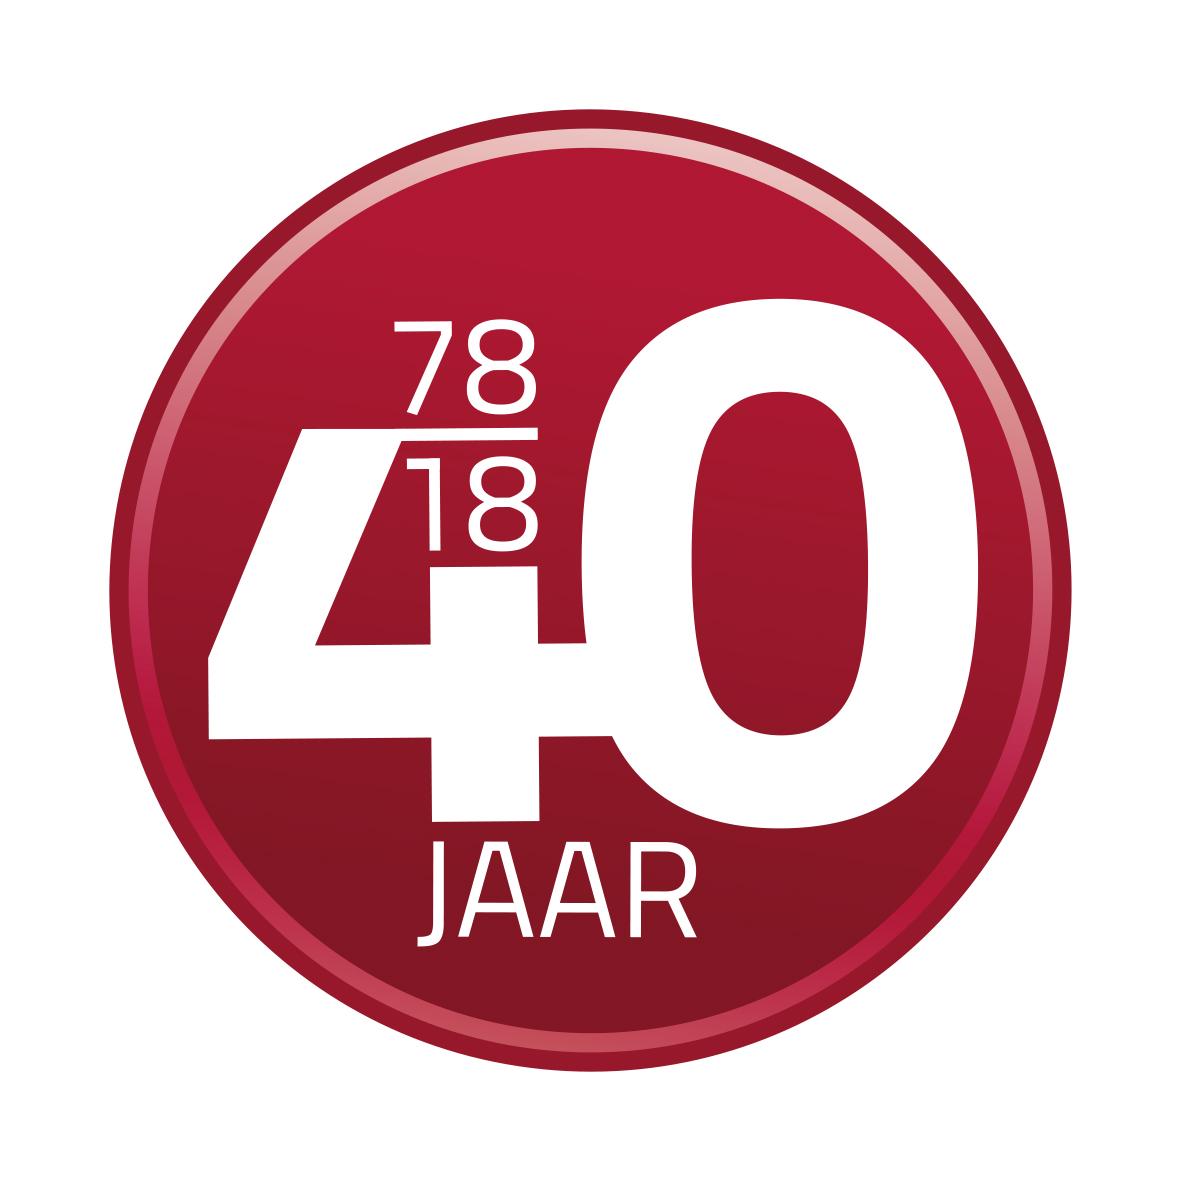 jubileum logo